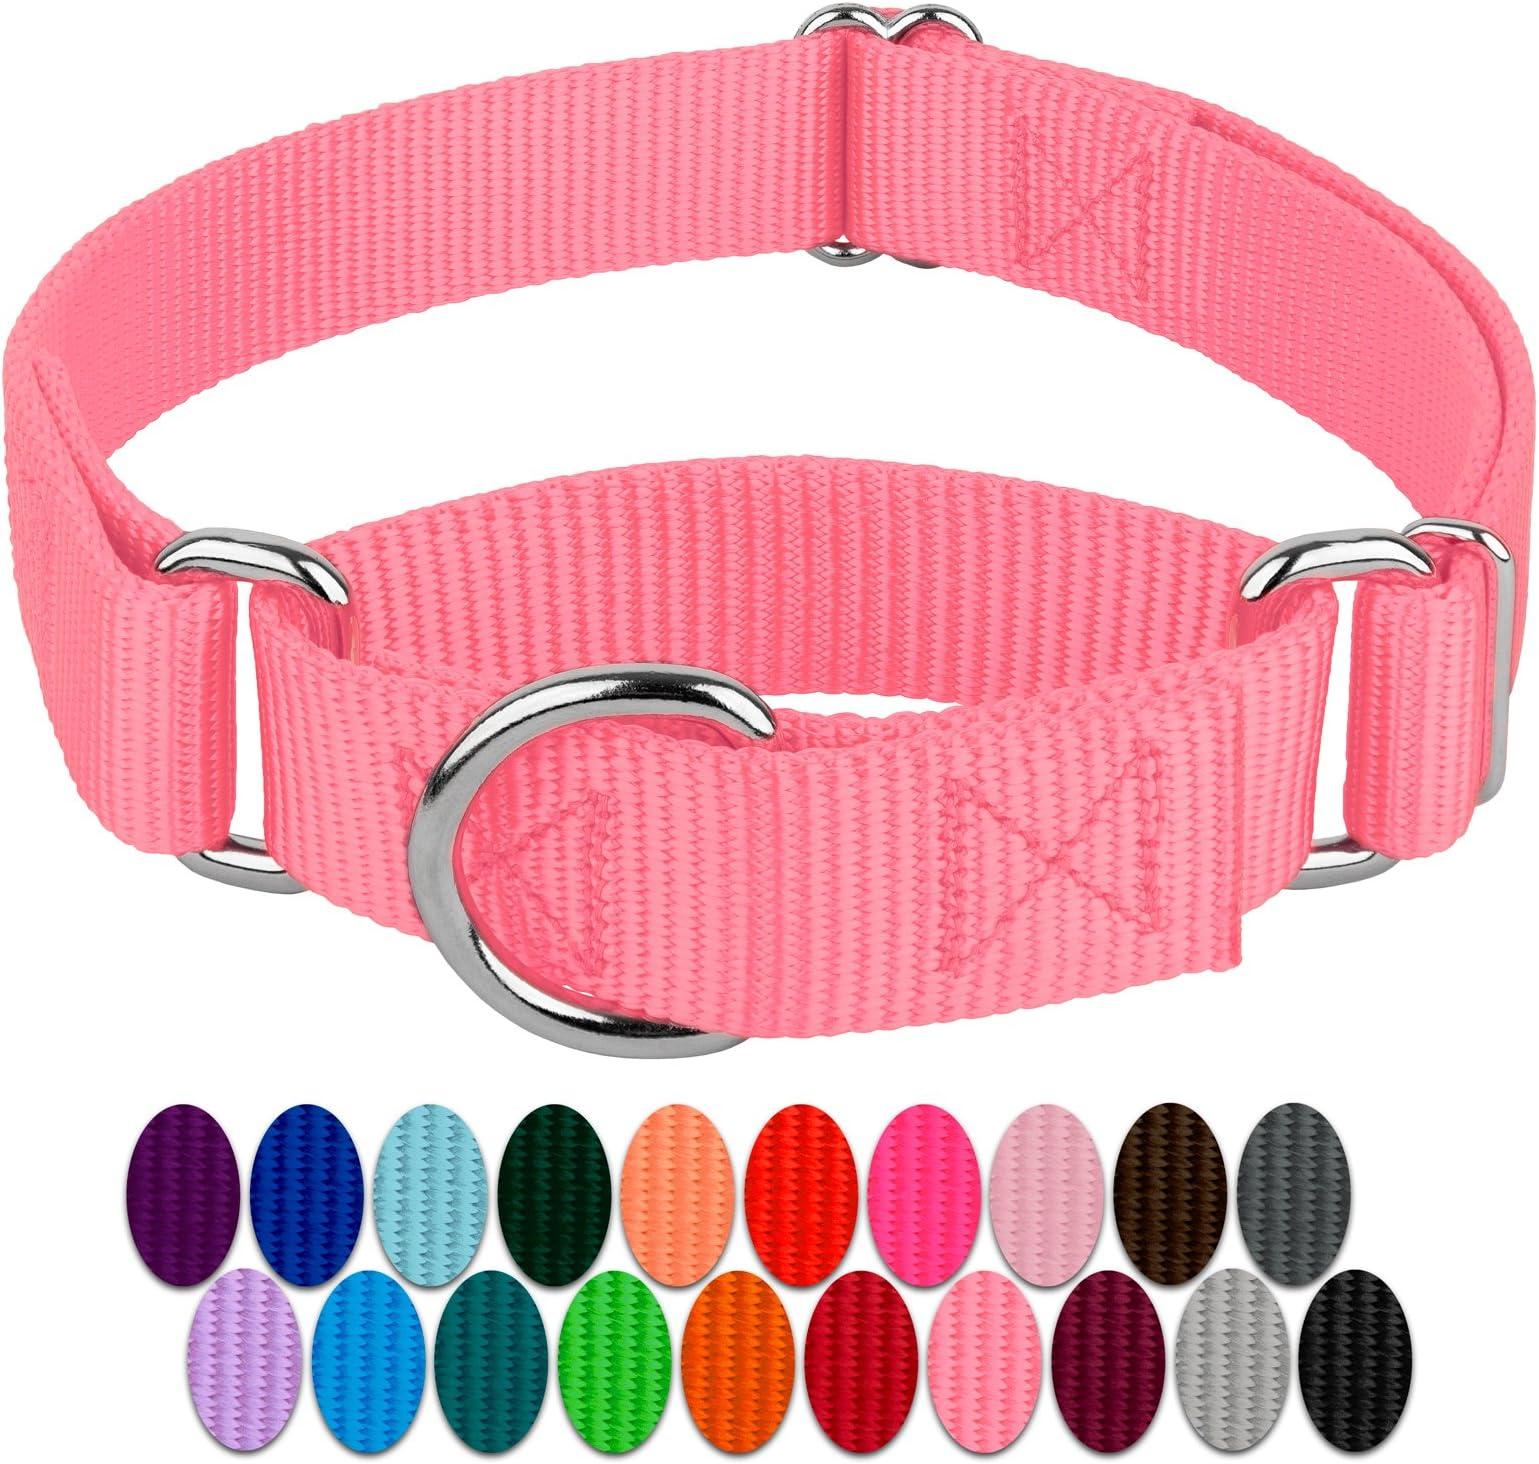 1 Metal Buckle Pink Floral Burst Dog Collar Pink Floral Dog Collar Martingale Dog Collar